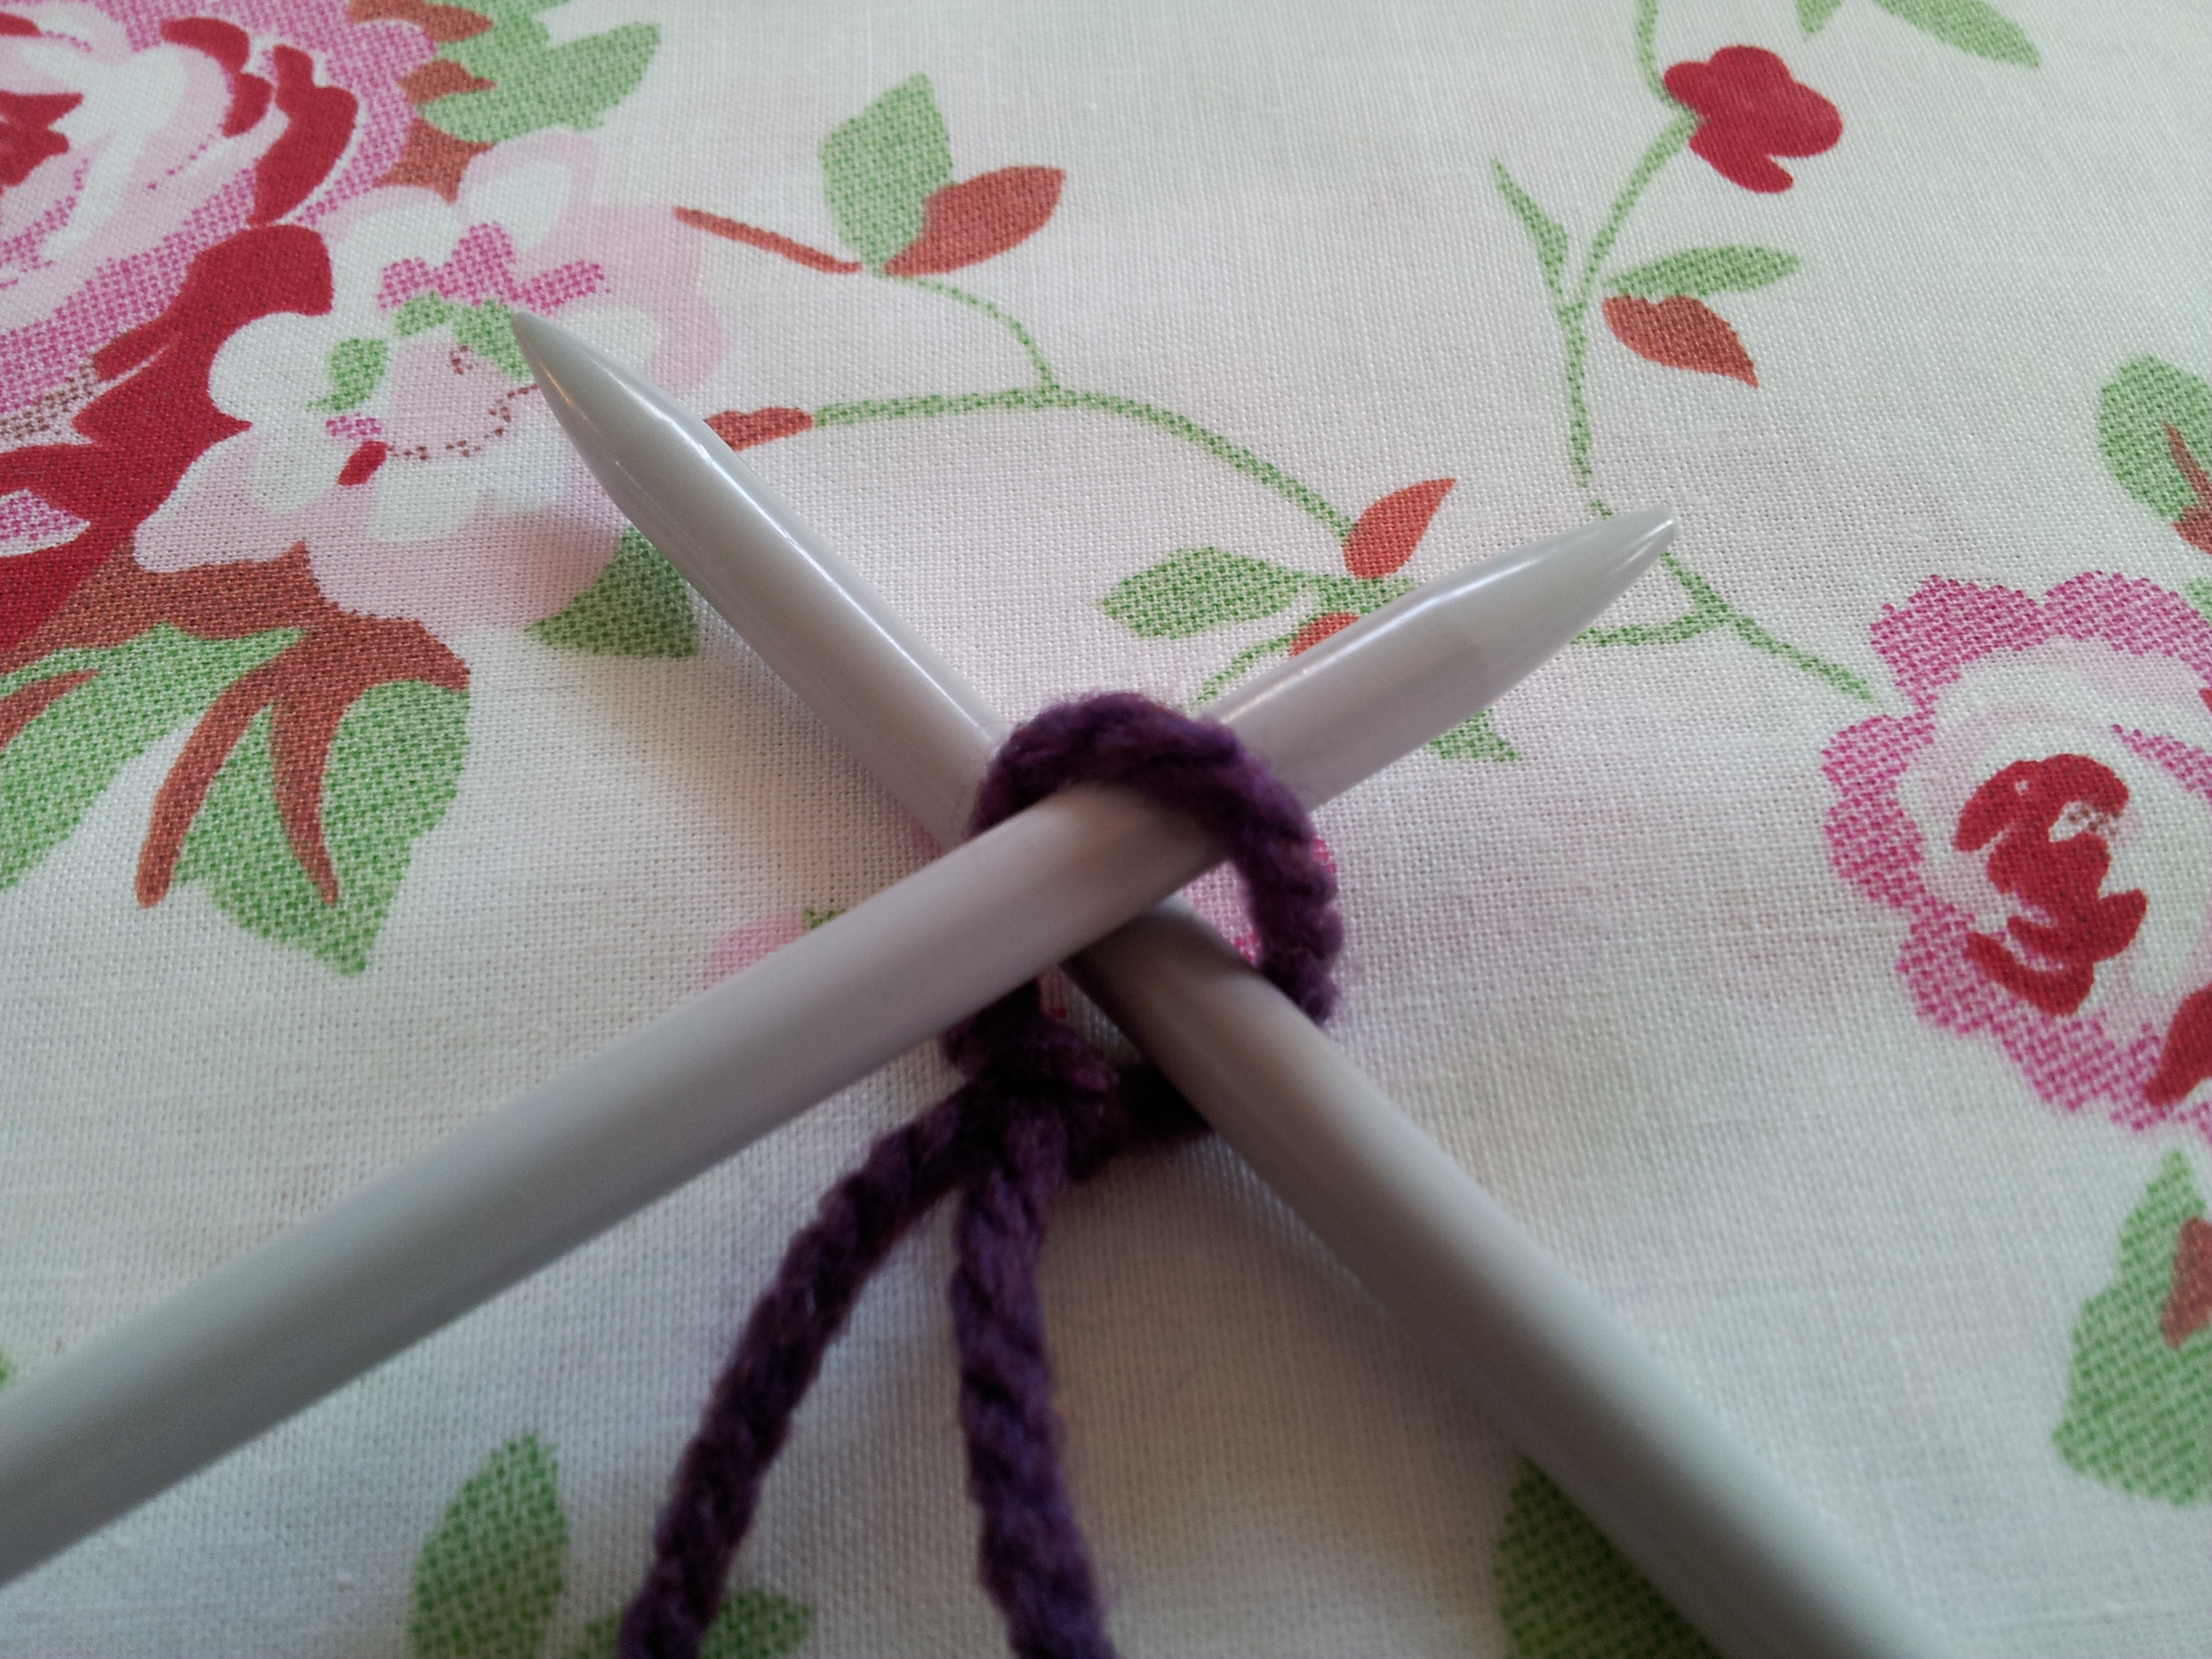 Knitting Rhyme Words : Back to basics casting on thestitchsharer